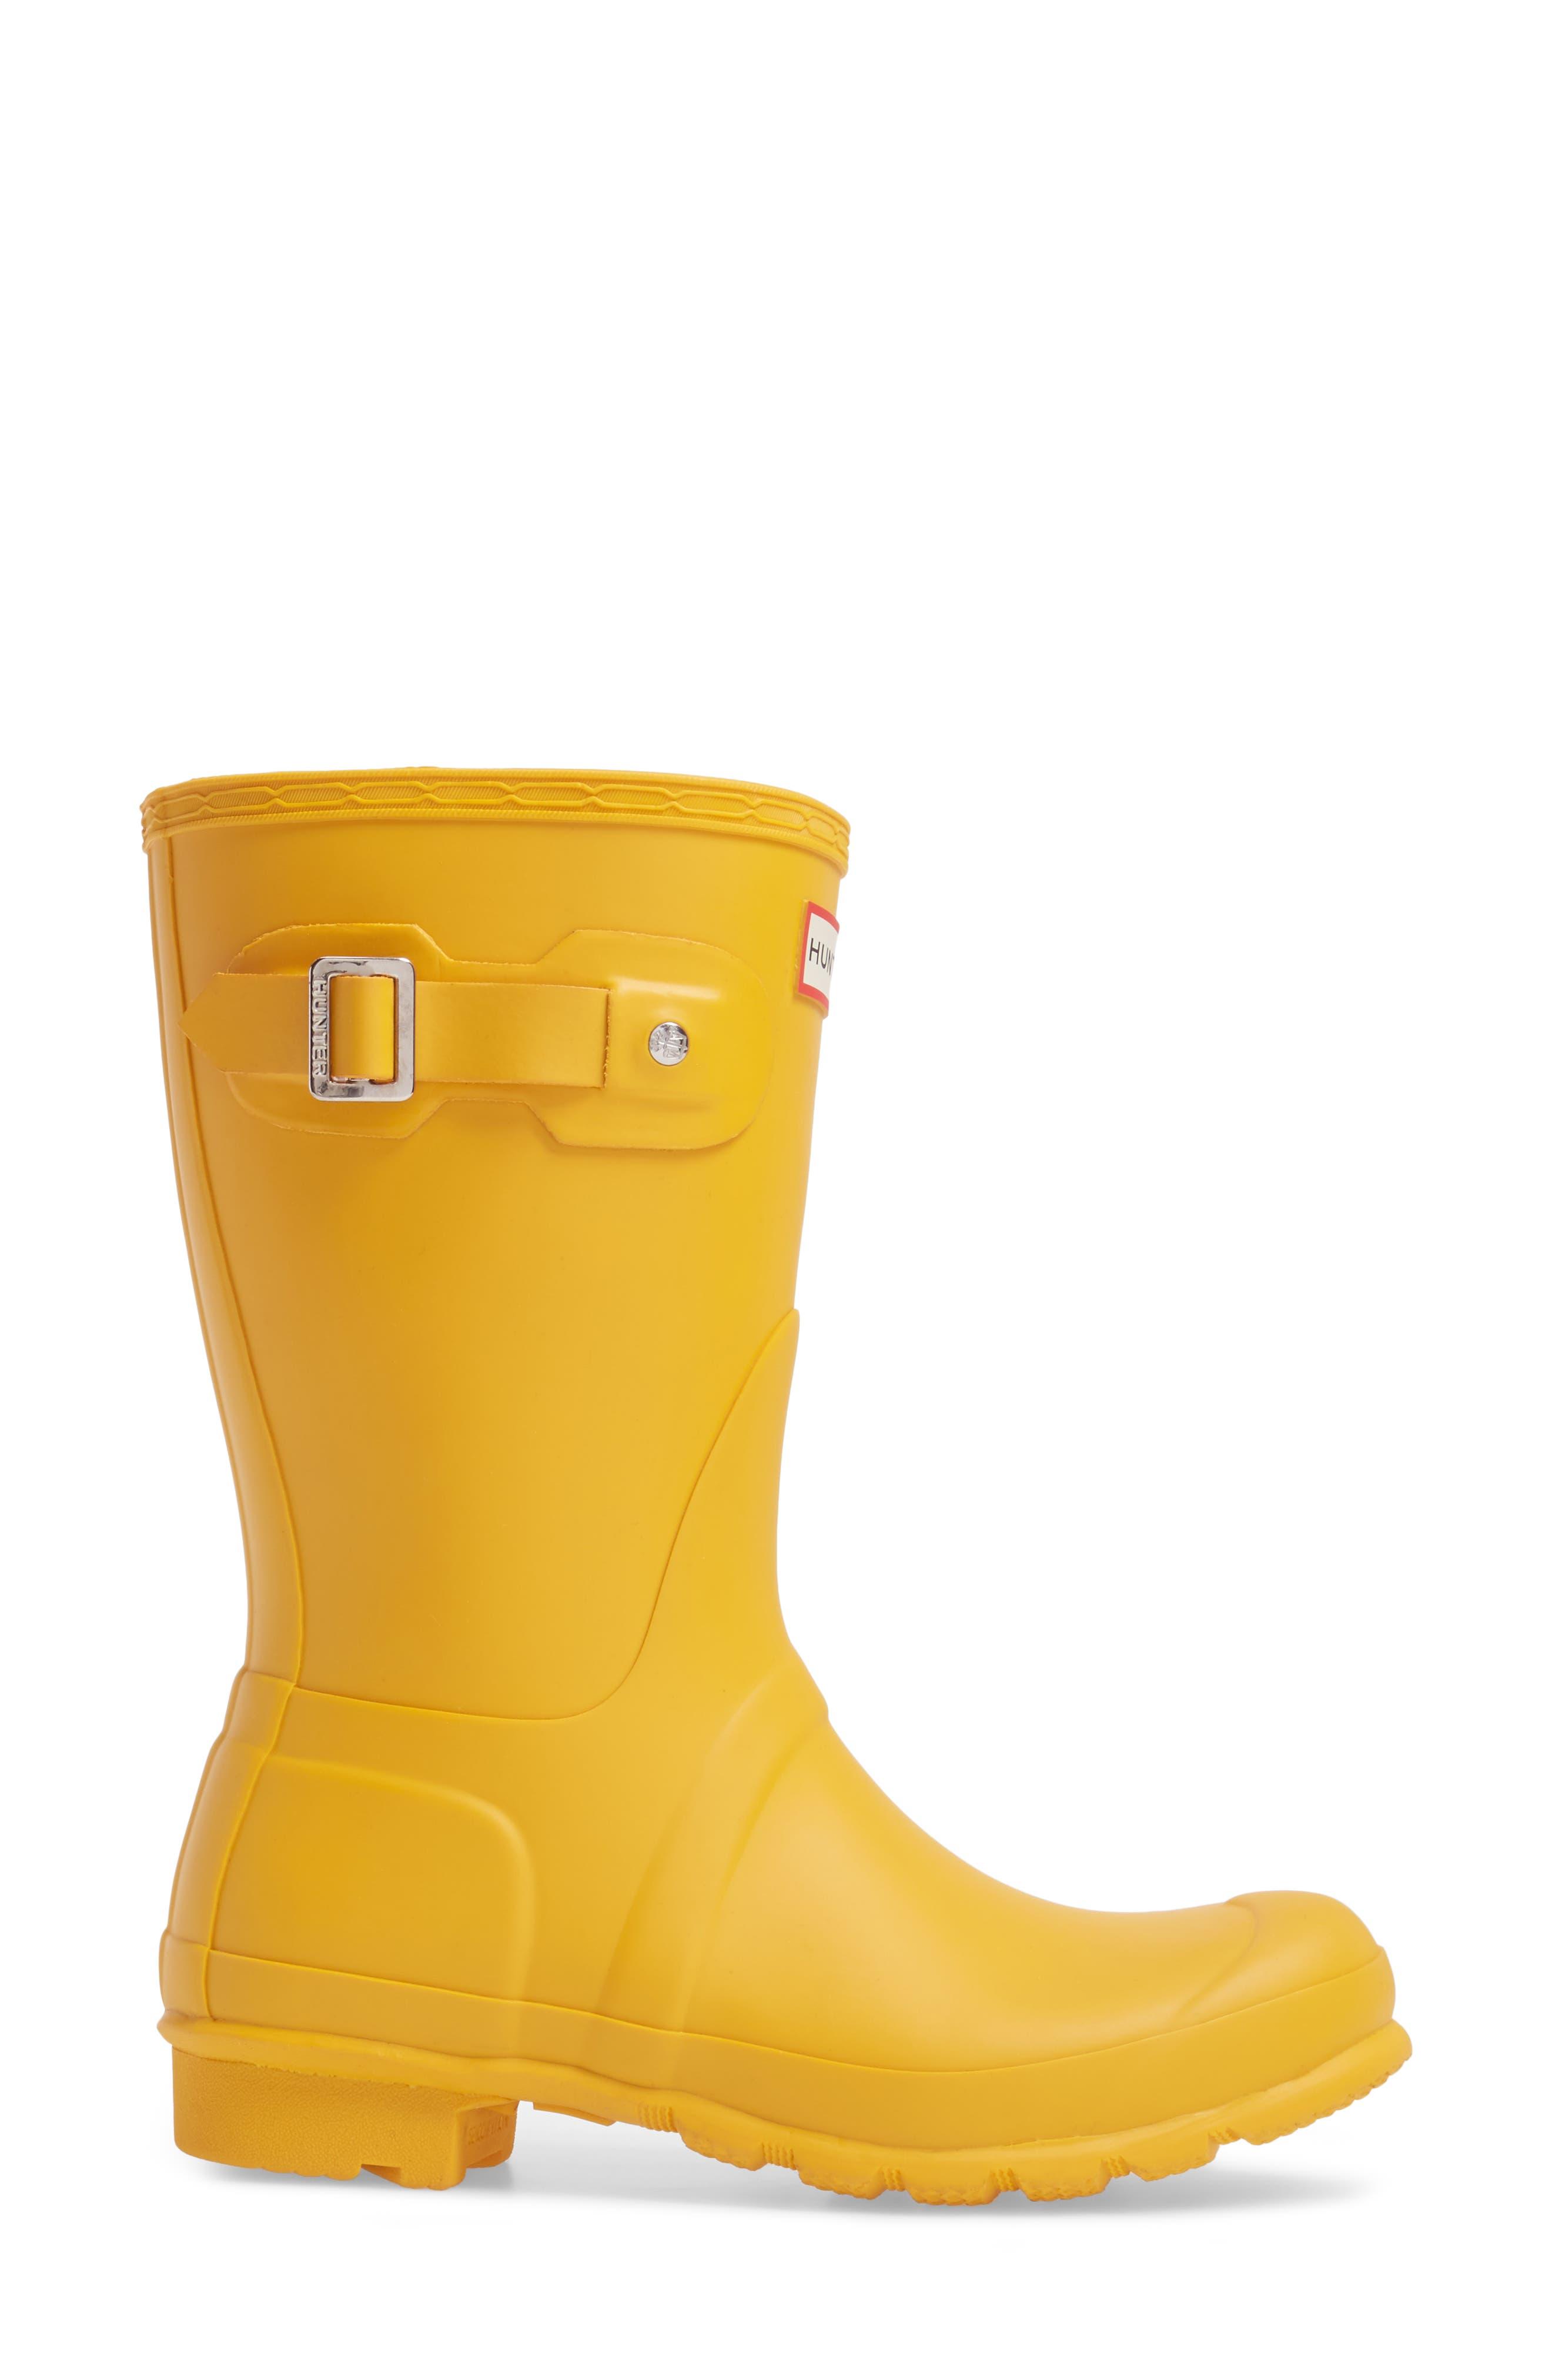 HUNTER, Original Short Waterproof Rain Boot, Alternate thumbnail 3, color, YELLOW/ YELLOW